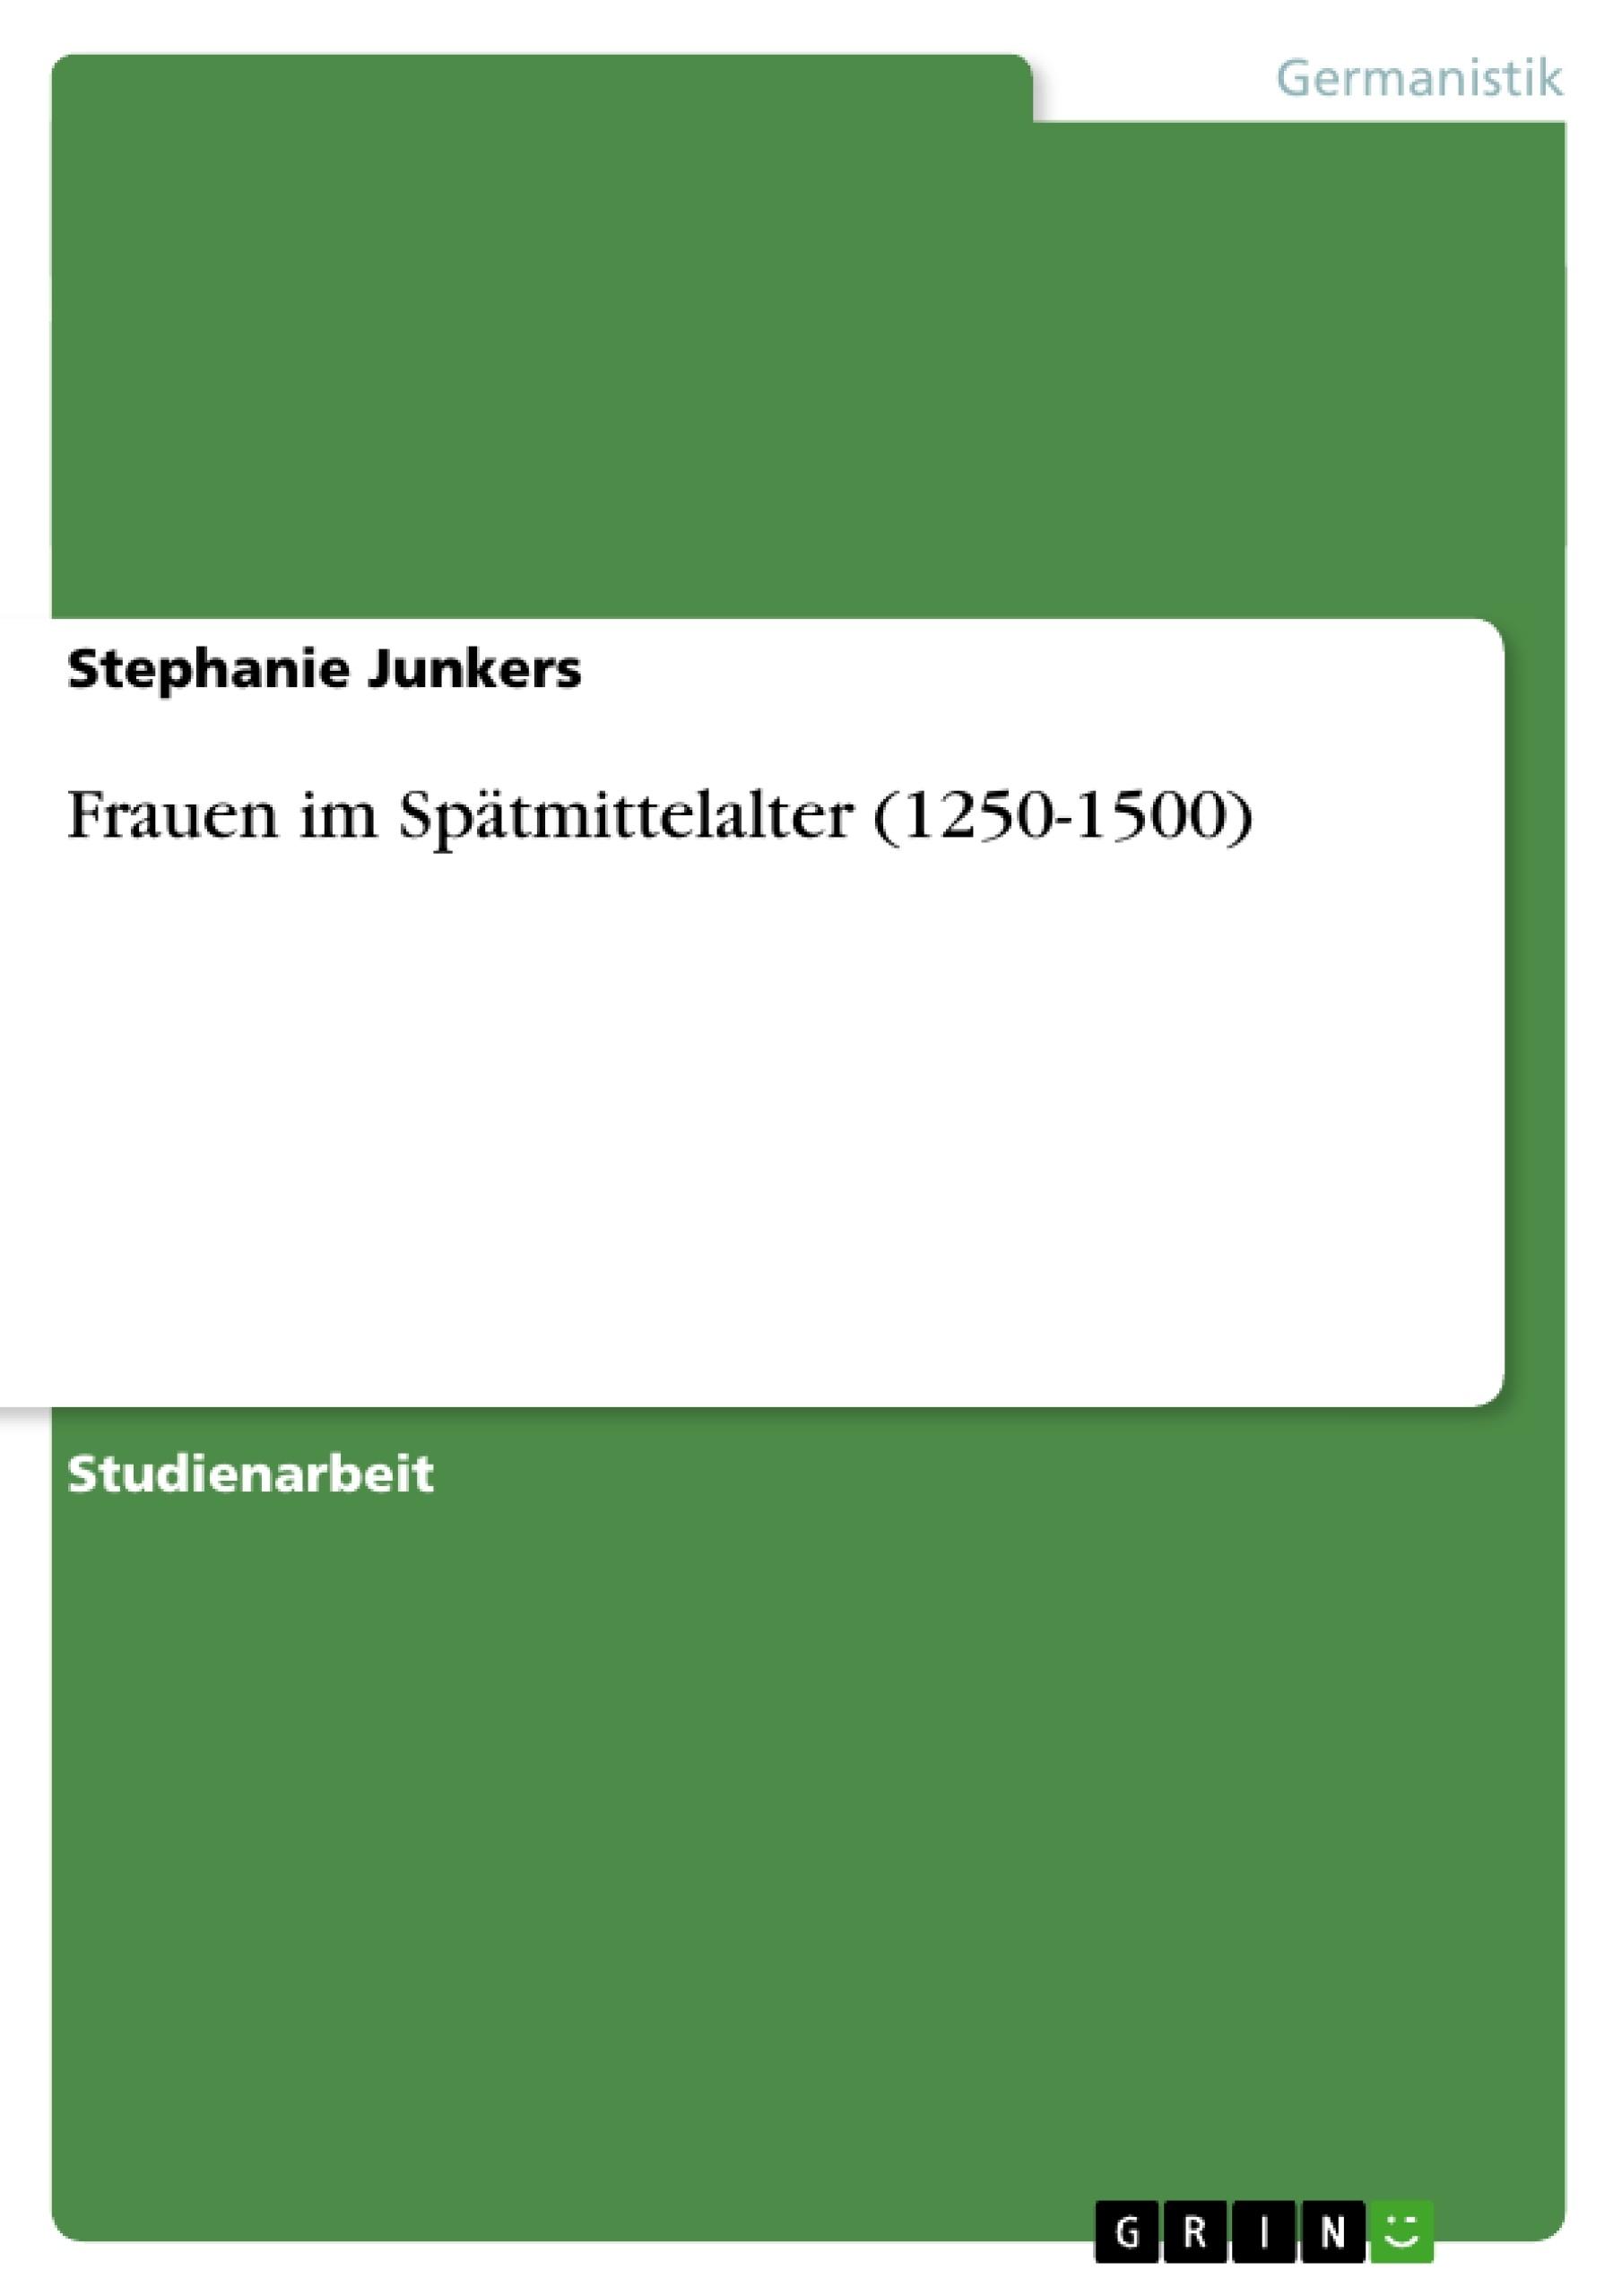 Titel: Frauen im Spätmittelalter (1250-1500)